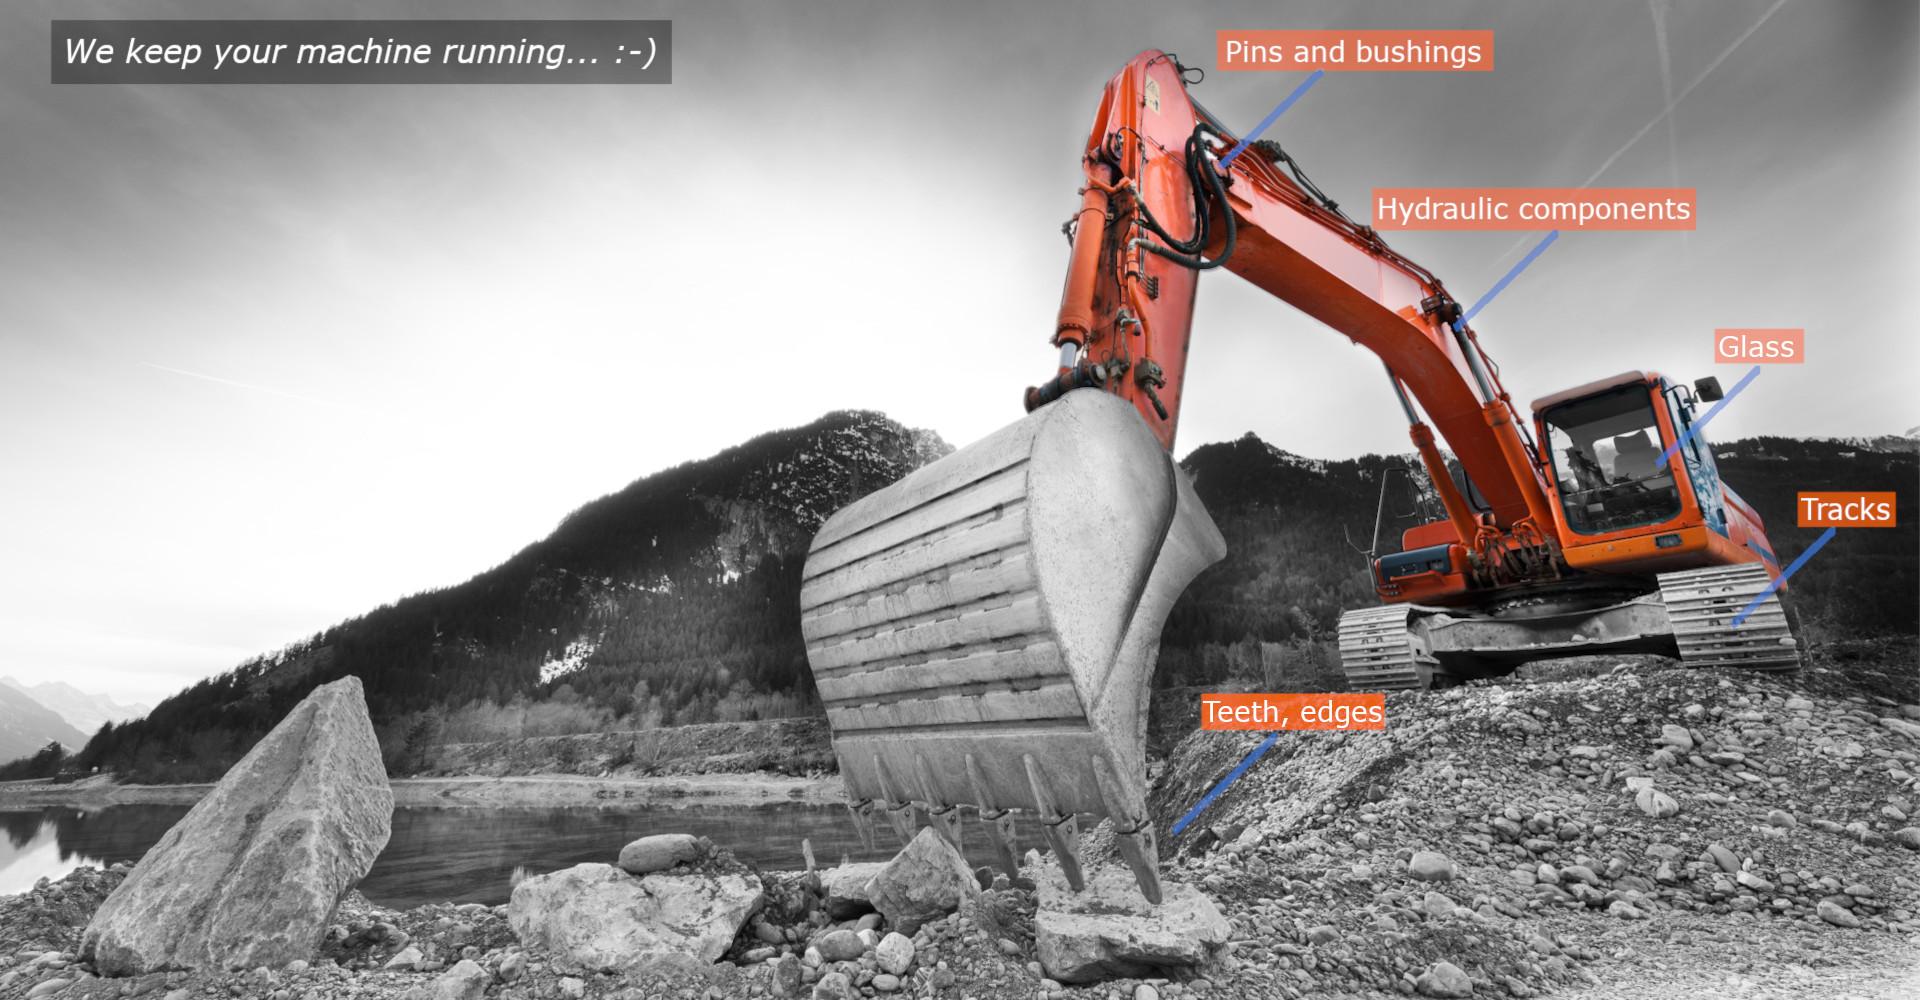 Spare parts for excavators, loaders, dozers